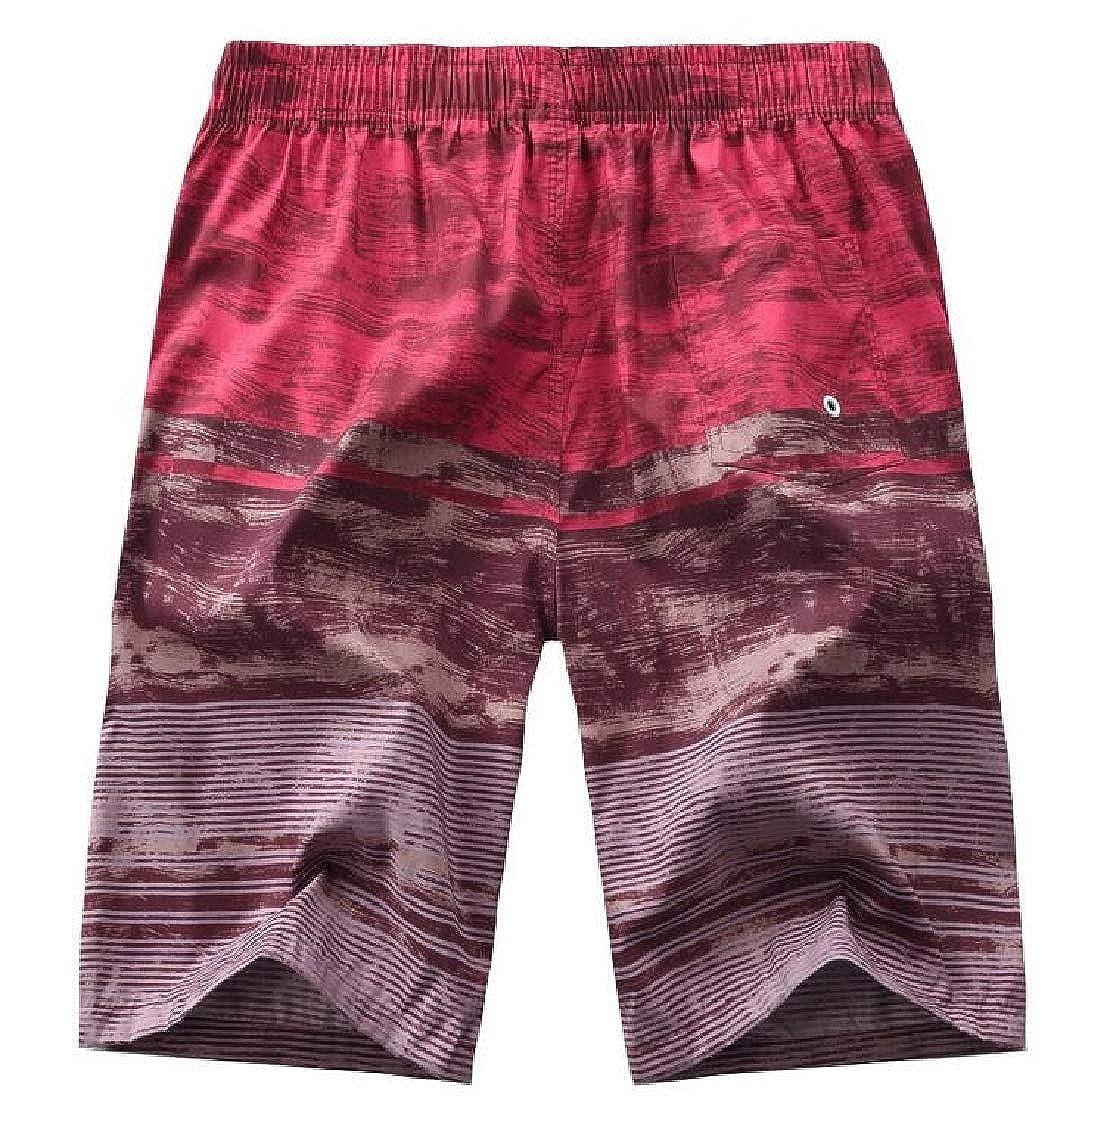 Nanquan Men Beach Elastic Waist Camo Casual Drawstring Printed Striped Shorts